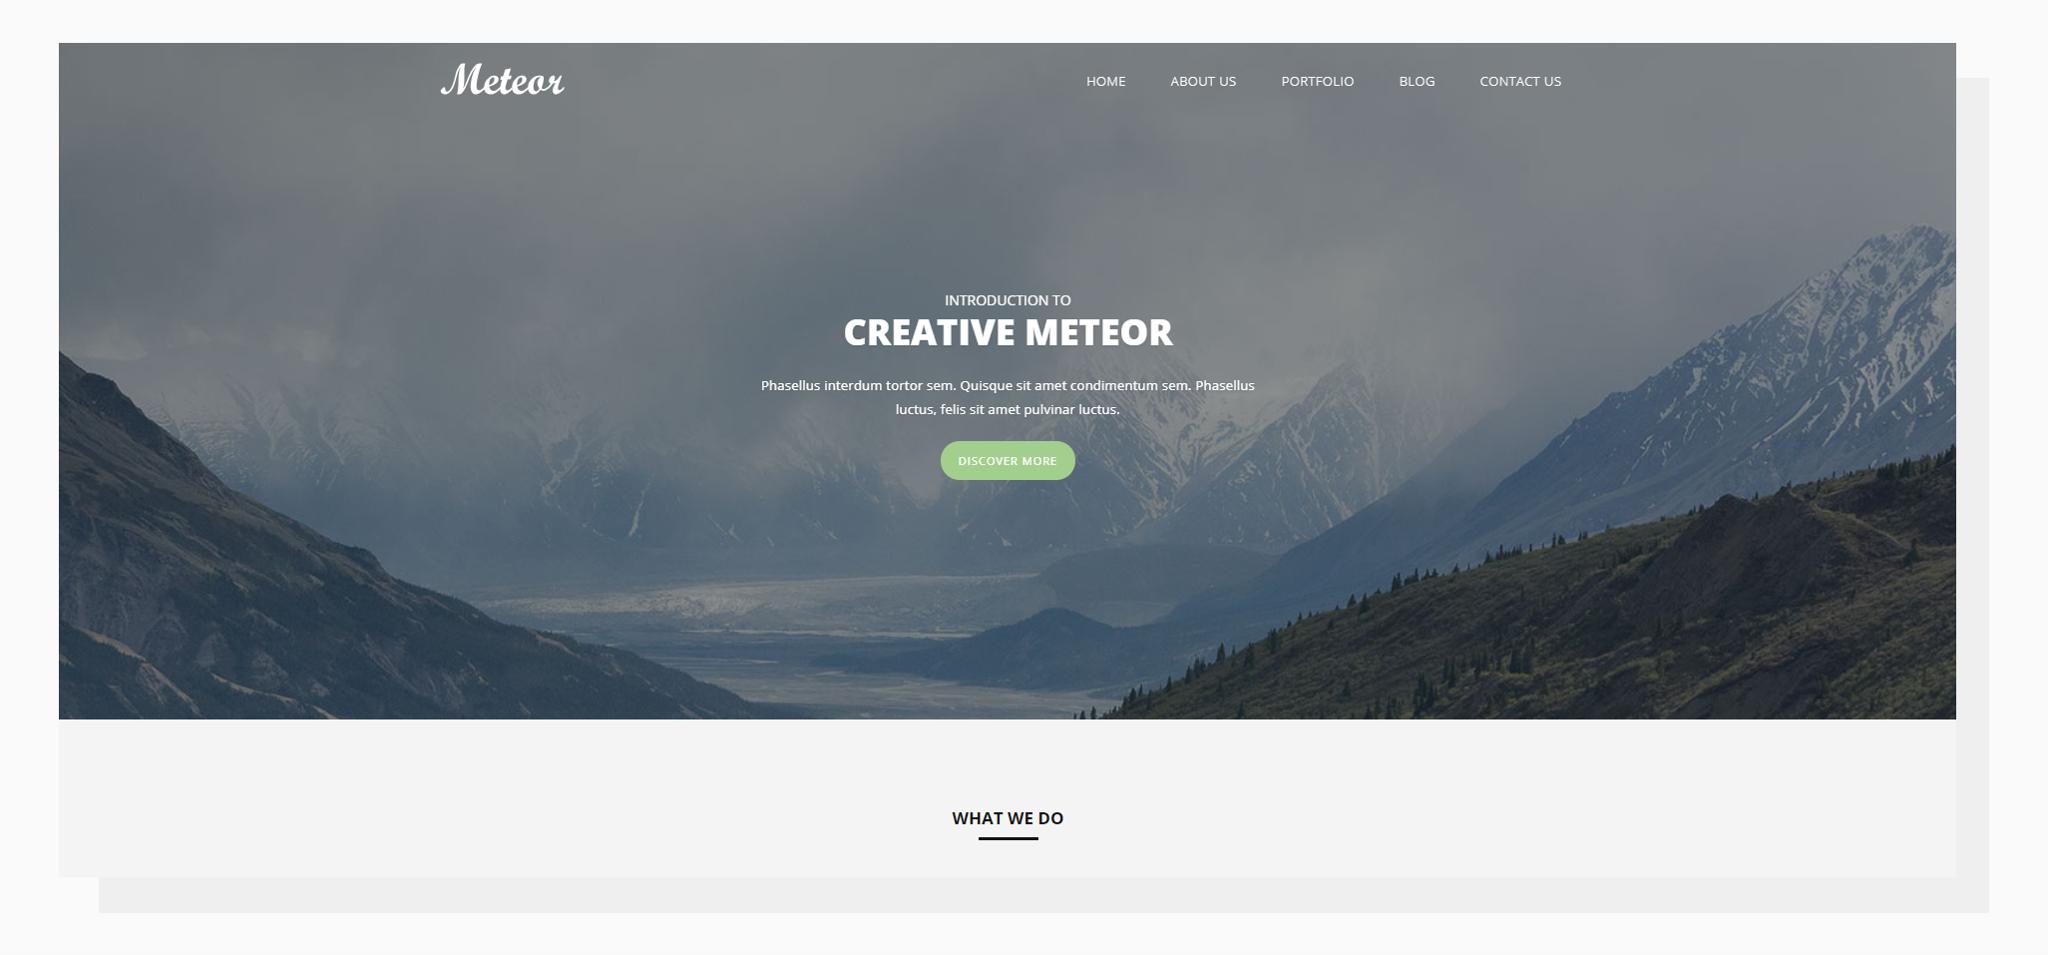 Free website template - Meteor